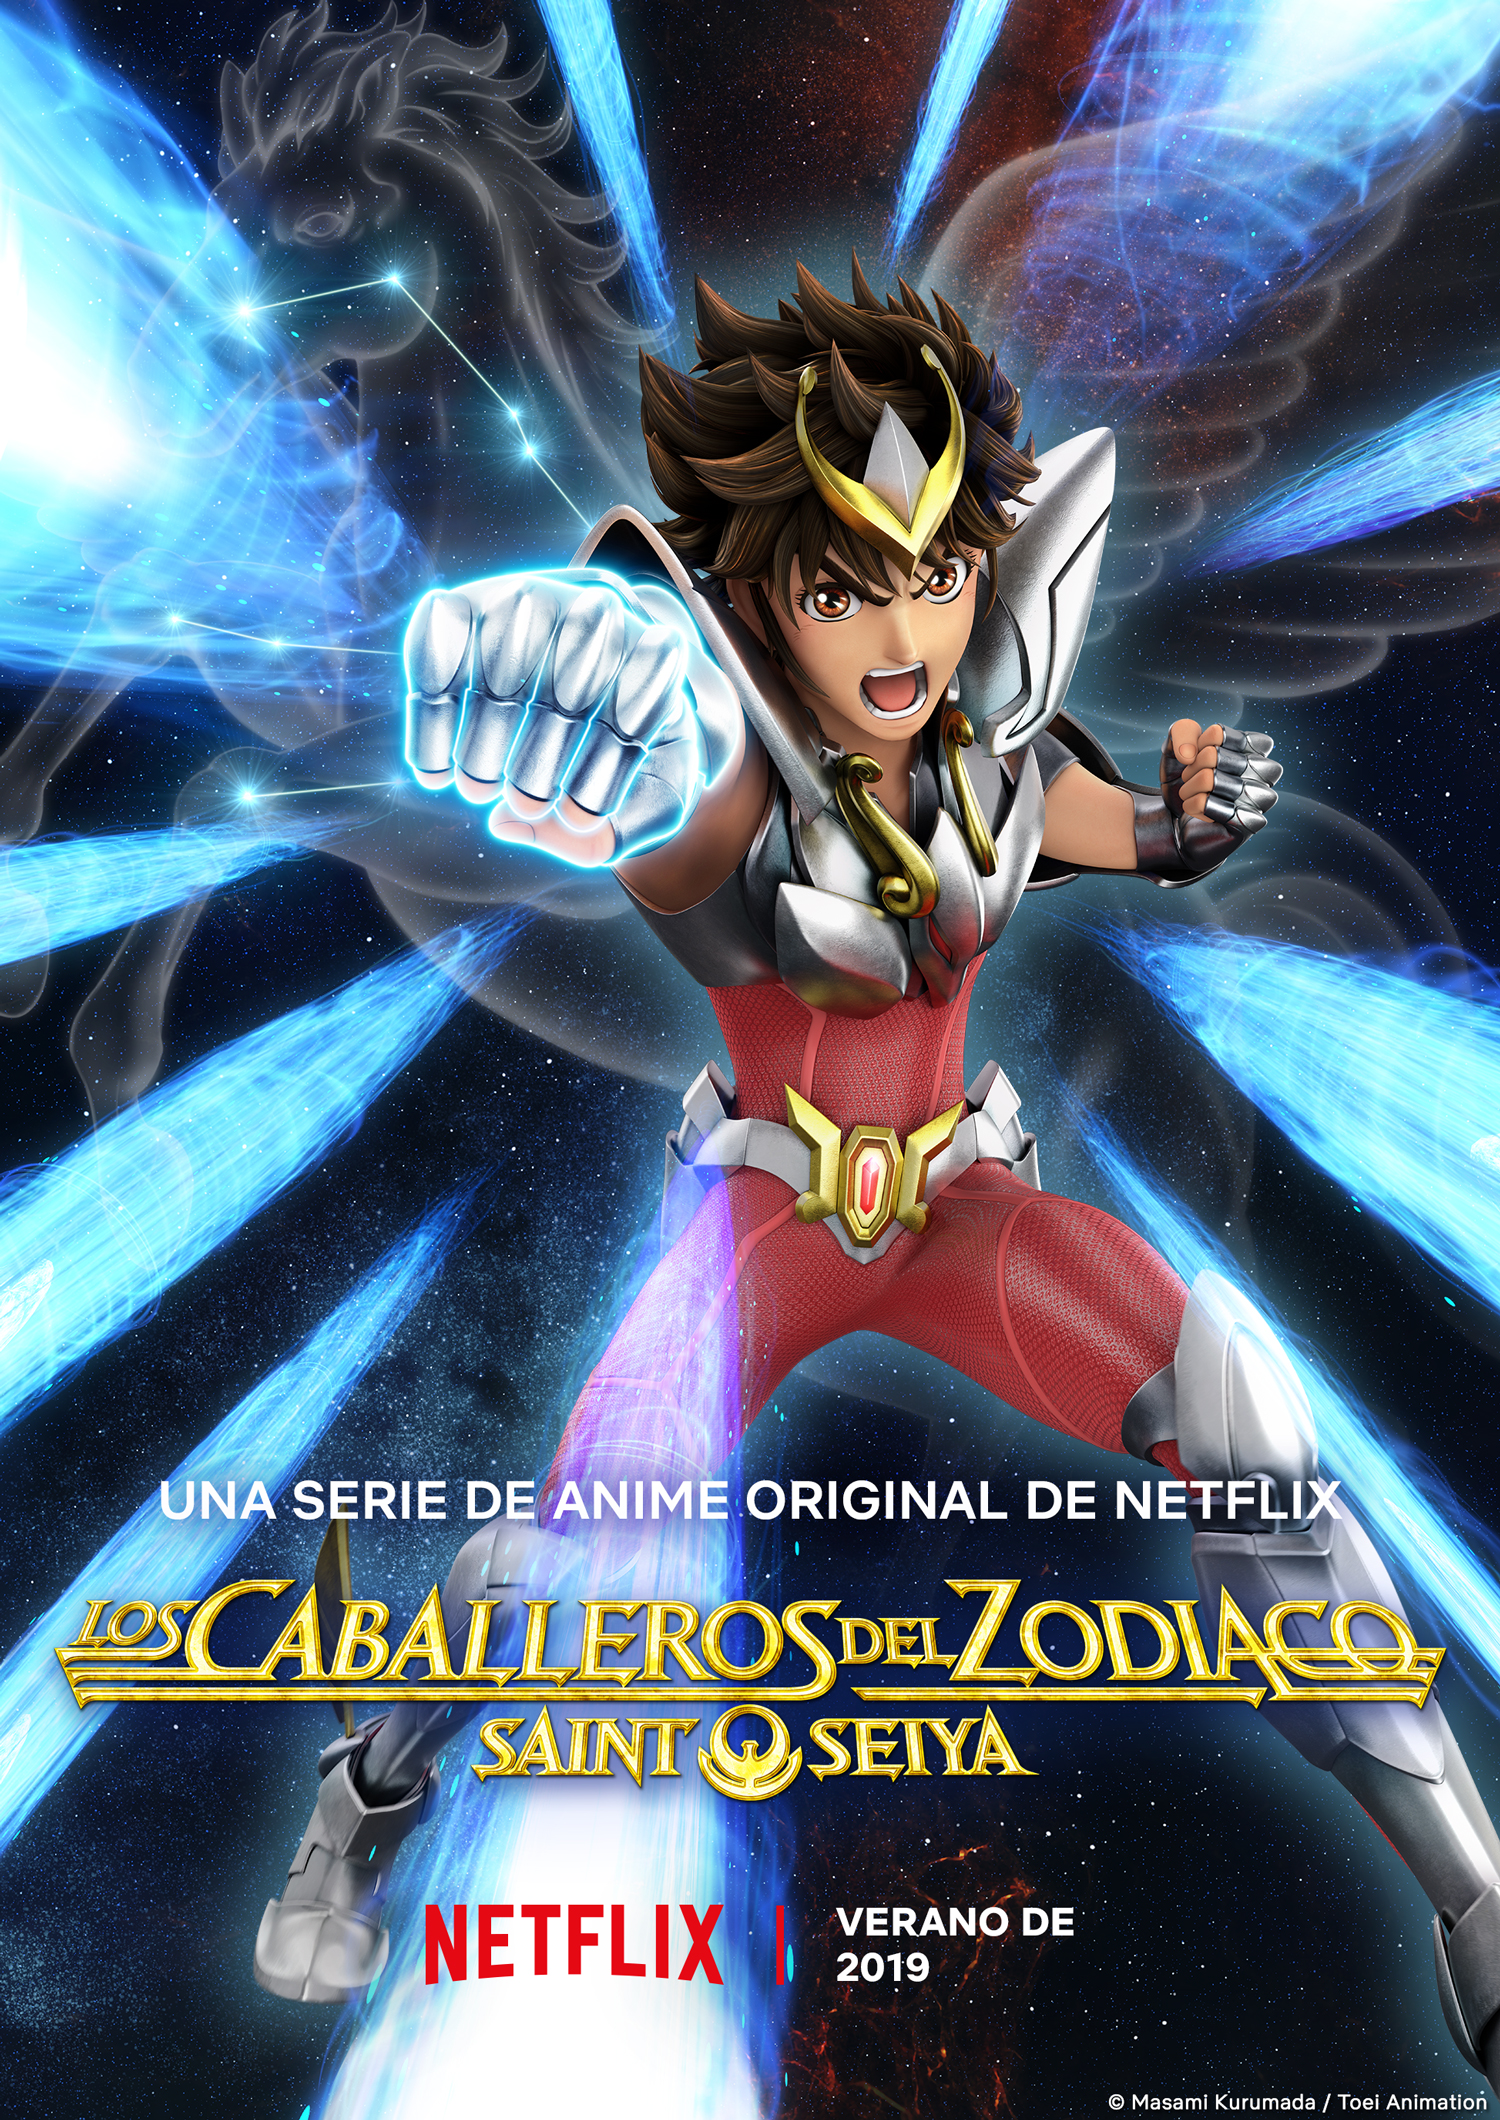 Â¡Saint Seiya! Netflix anuncia los estrenos de animes para 2019